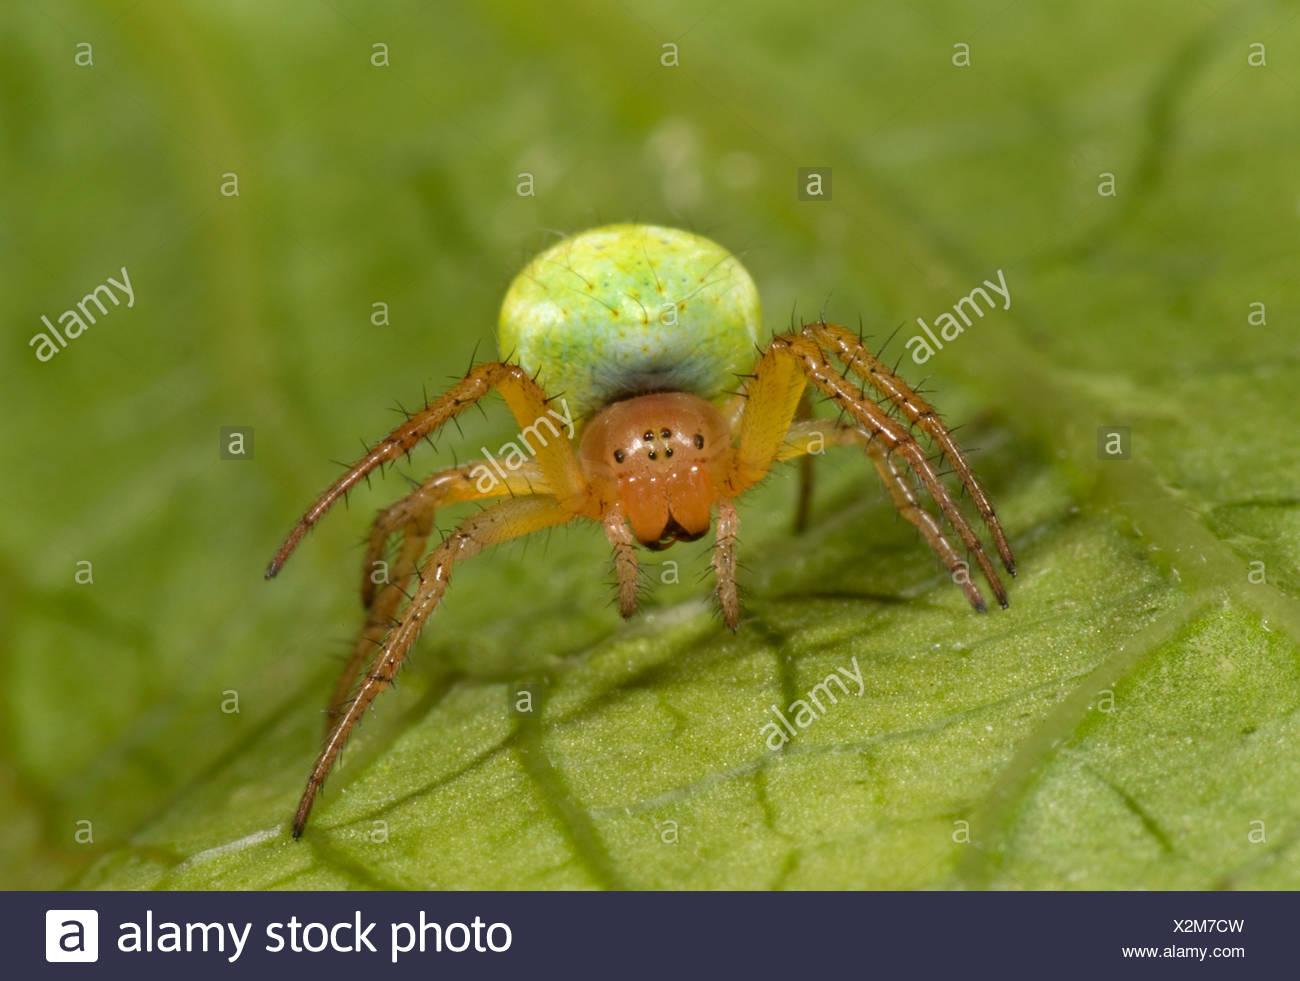 Cucumber or Green Orb Weaver Spider Araniella cucurbitina on leaf in garden bright green abdomen - Stock Image